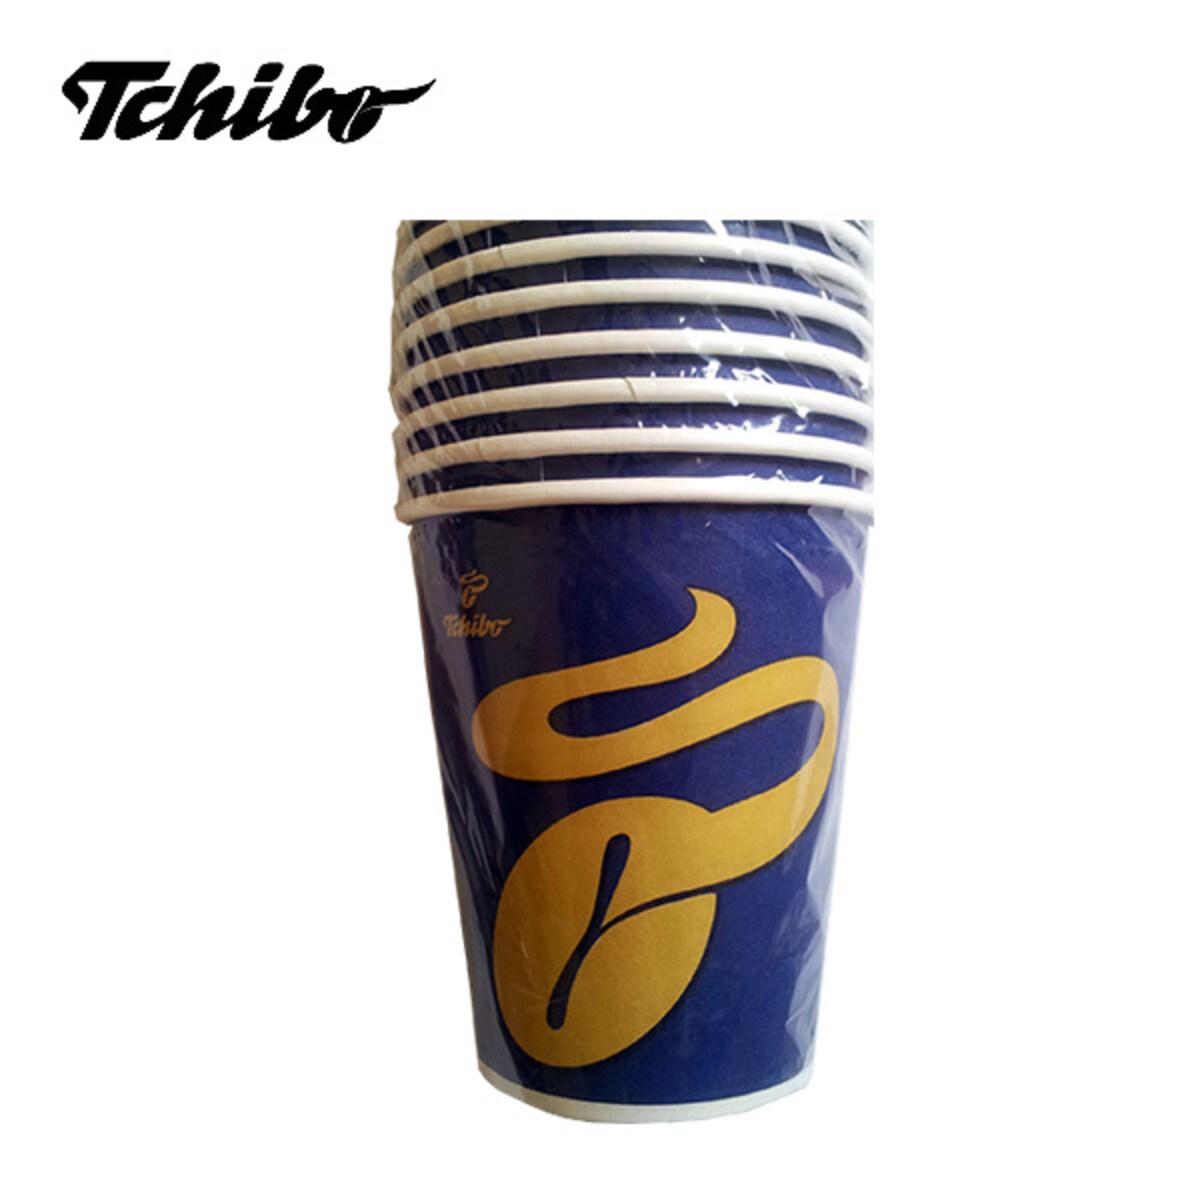 Картонени чаши Тчибо - 50бр, 200мл